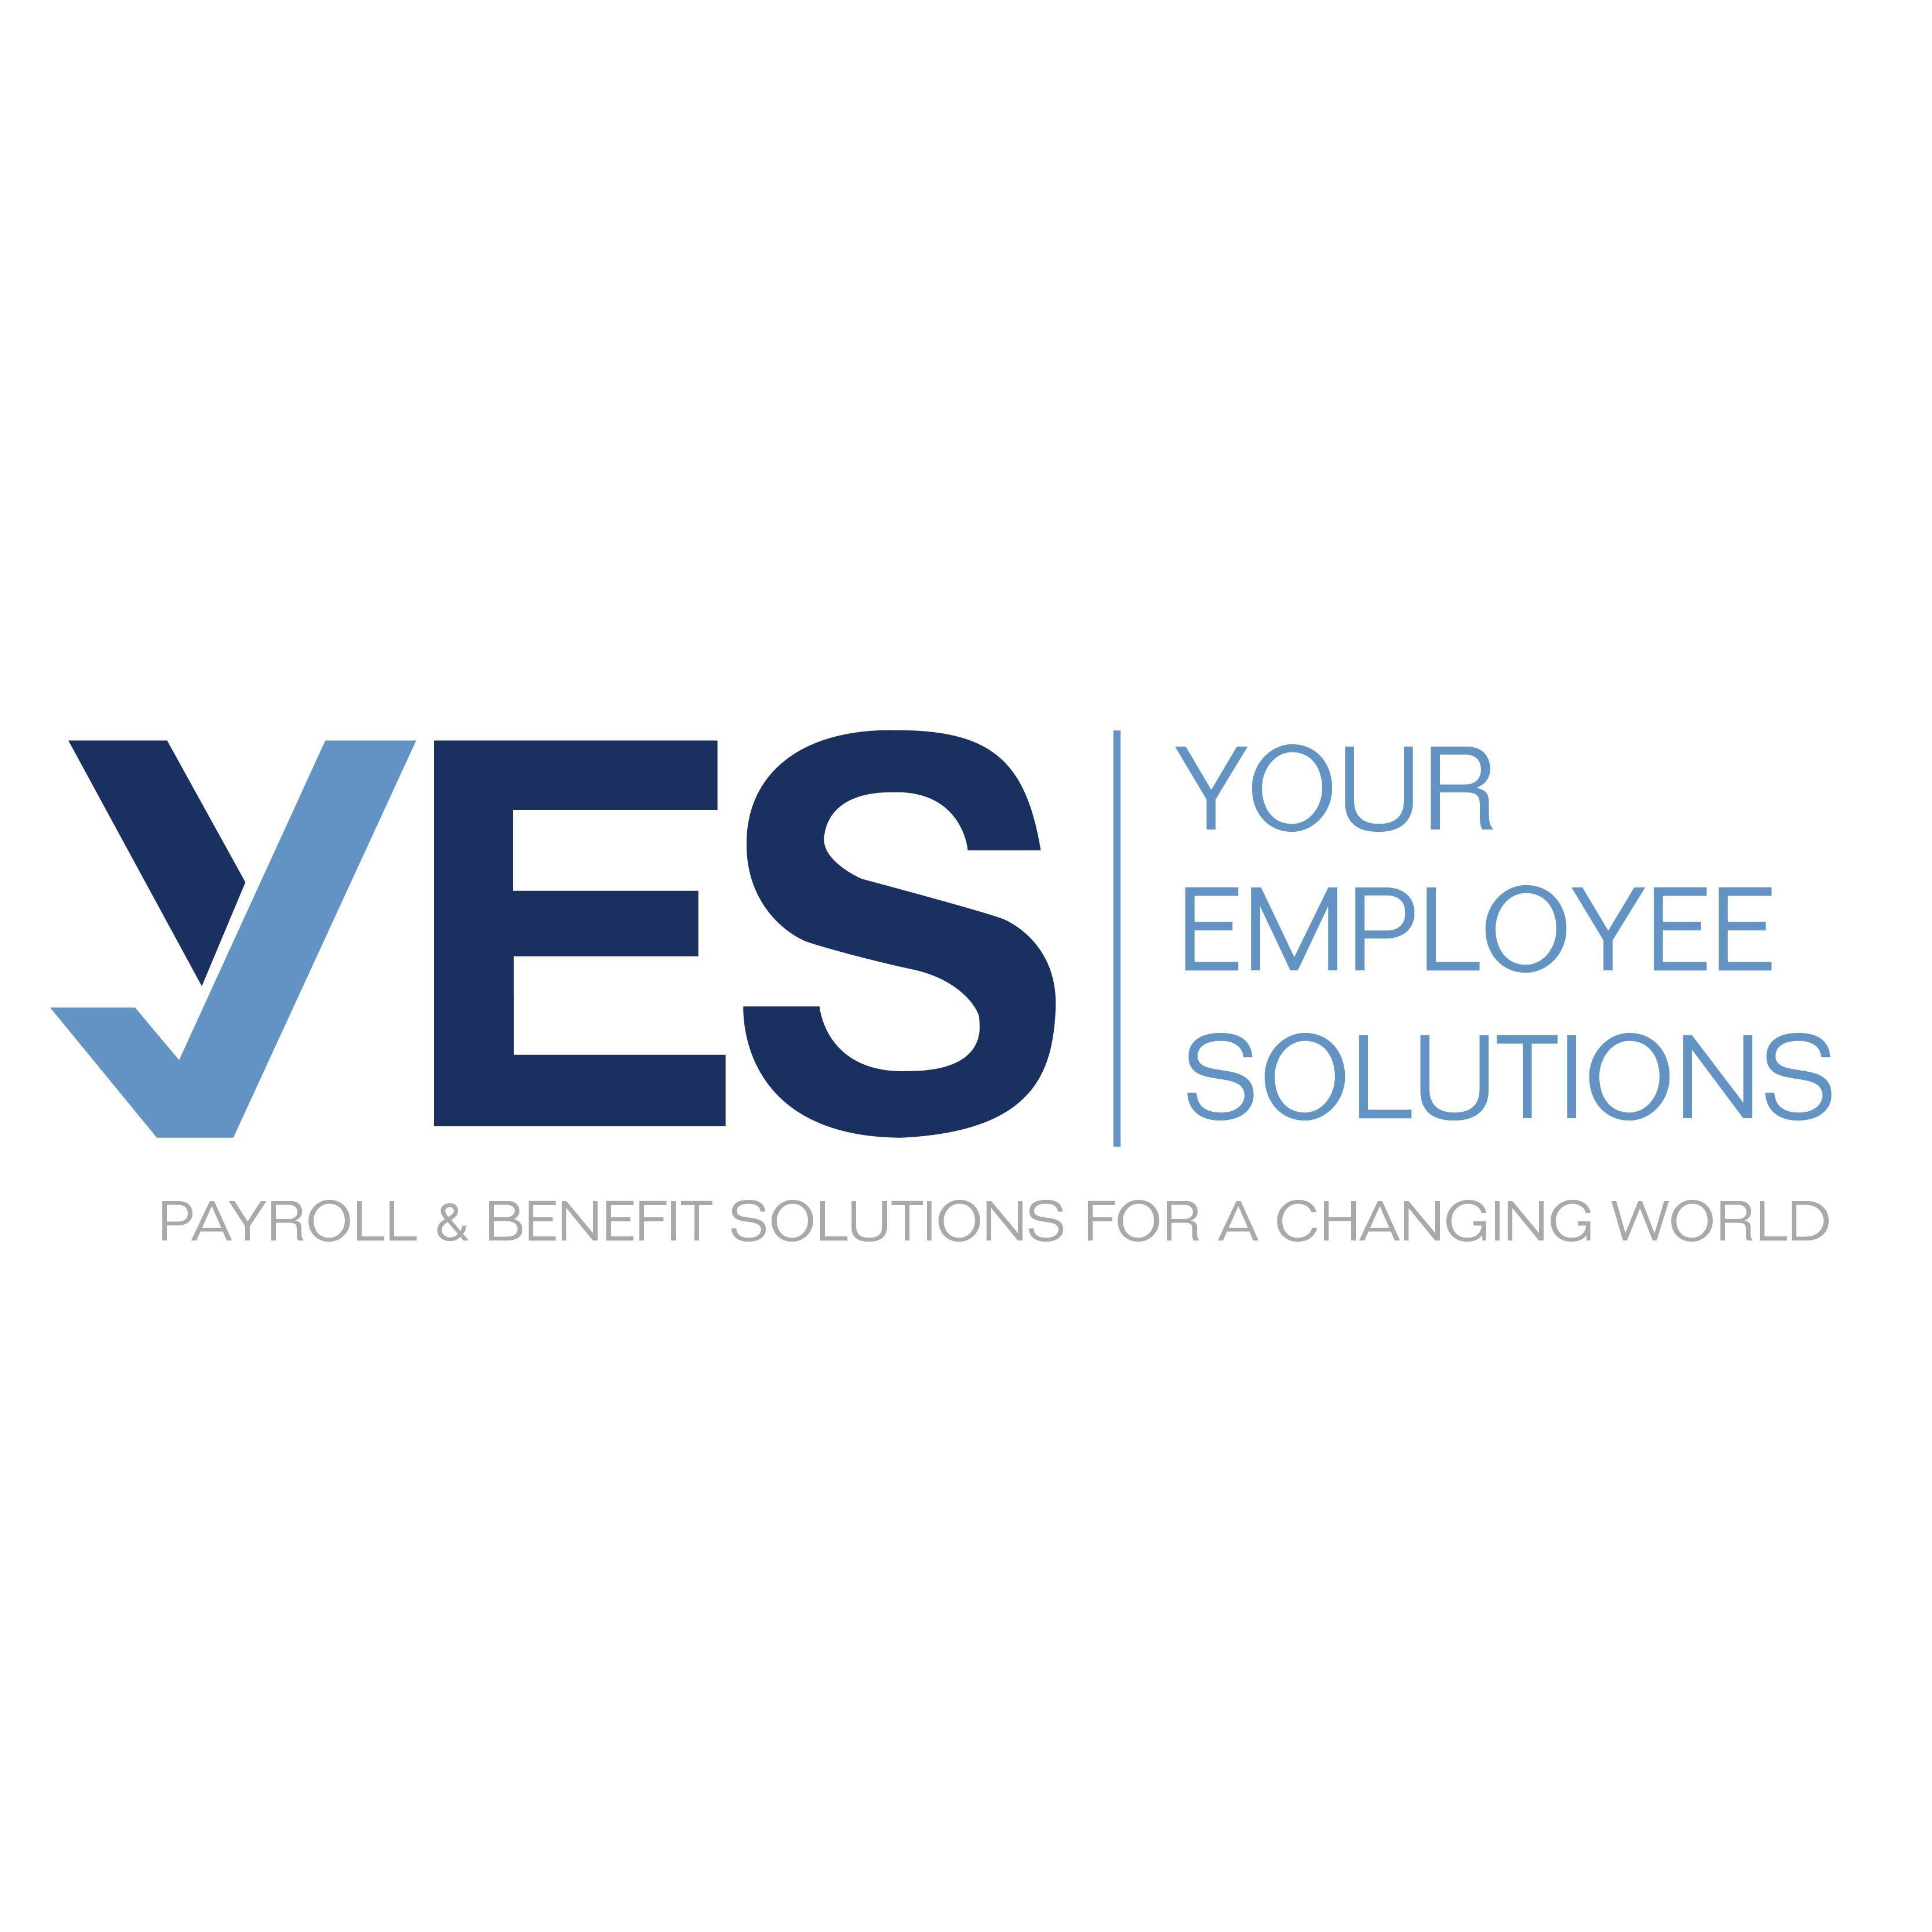 Your Employee Solutions Yes Atlanta Georgia Ga